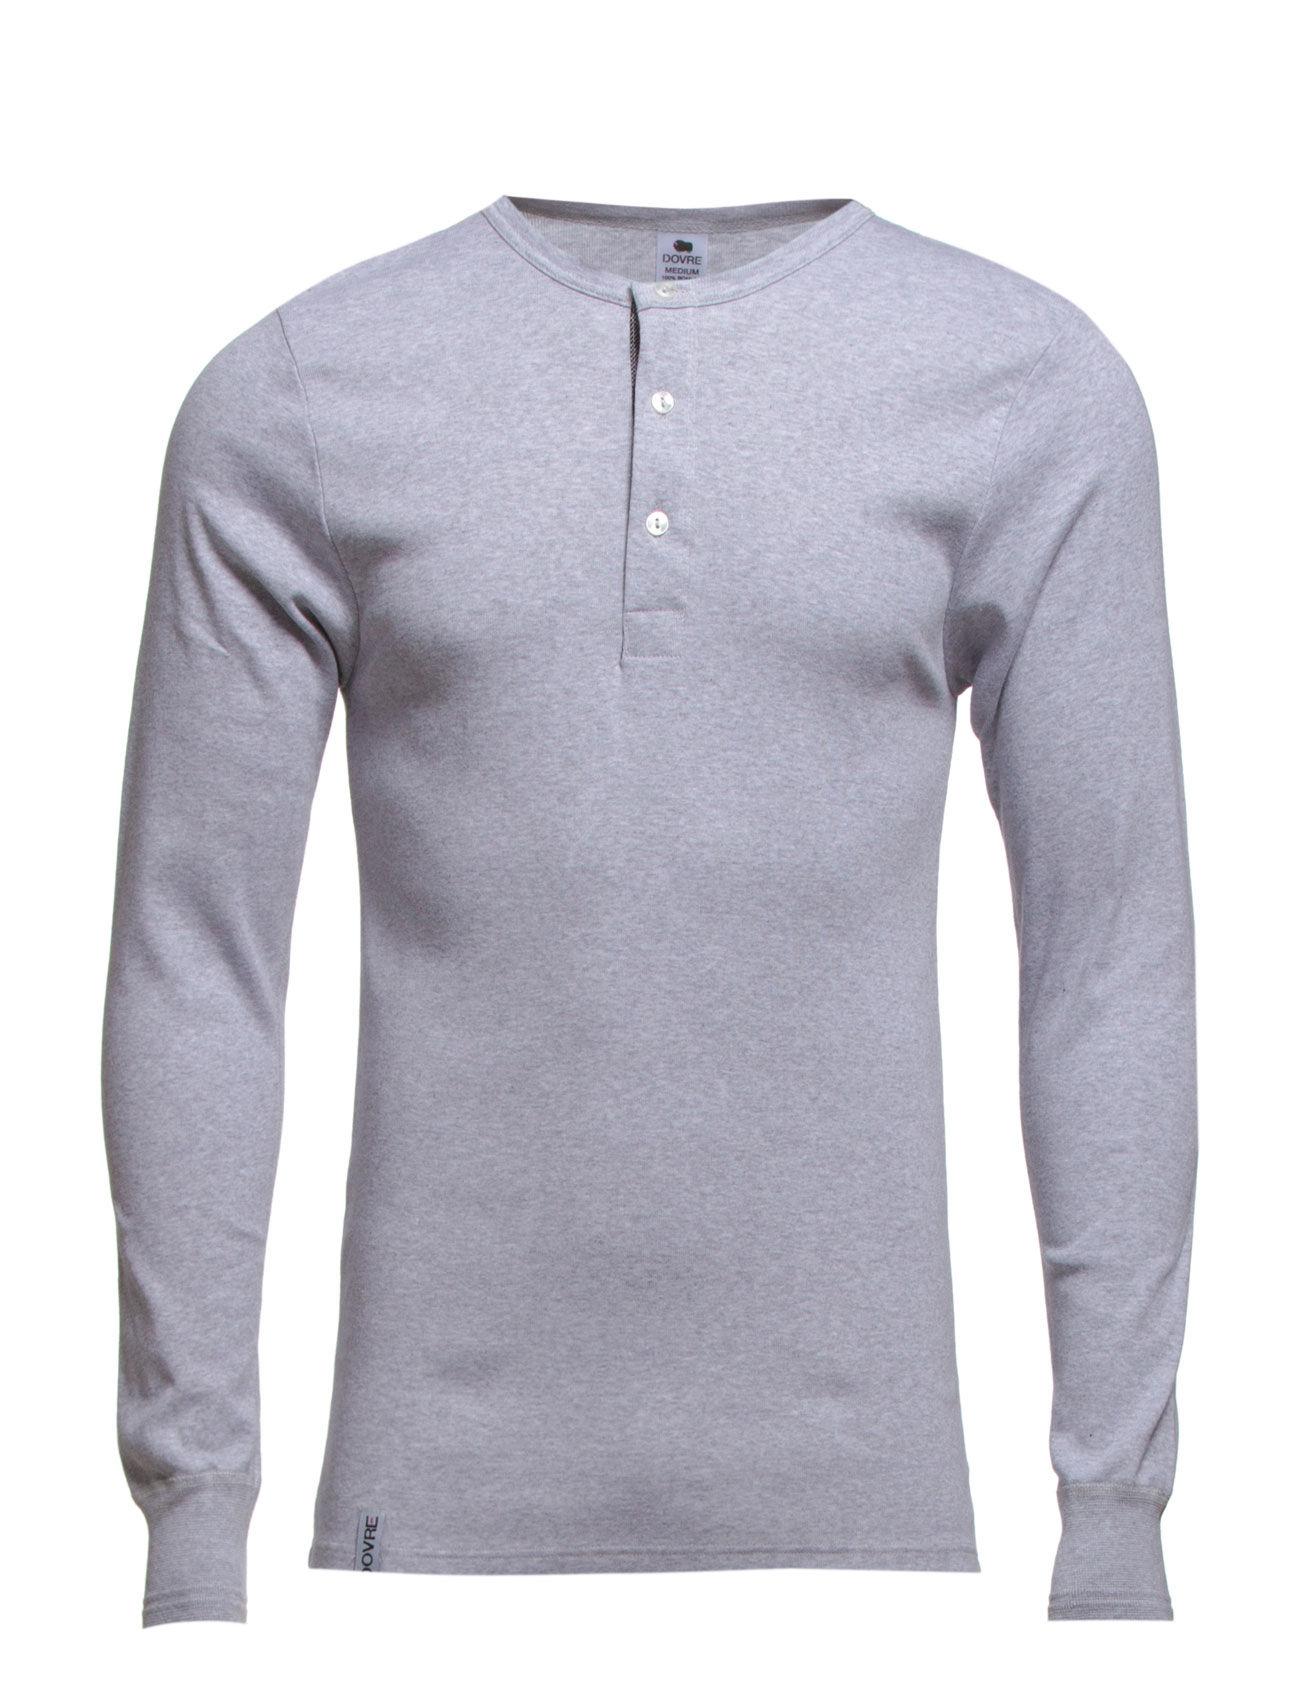 Dovre - Dovre T-shirt Long sleeves - t-krekli ar garām piedurknēm - grey melan - 0